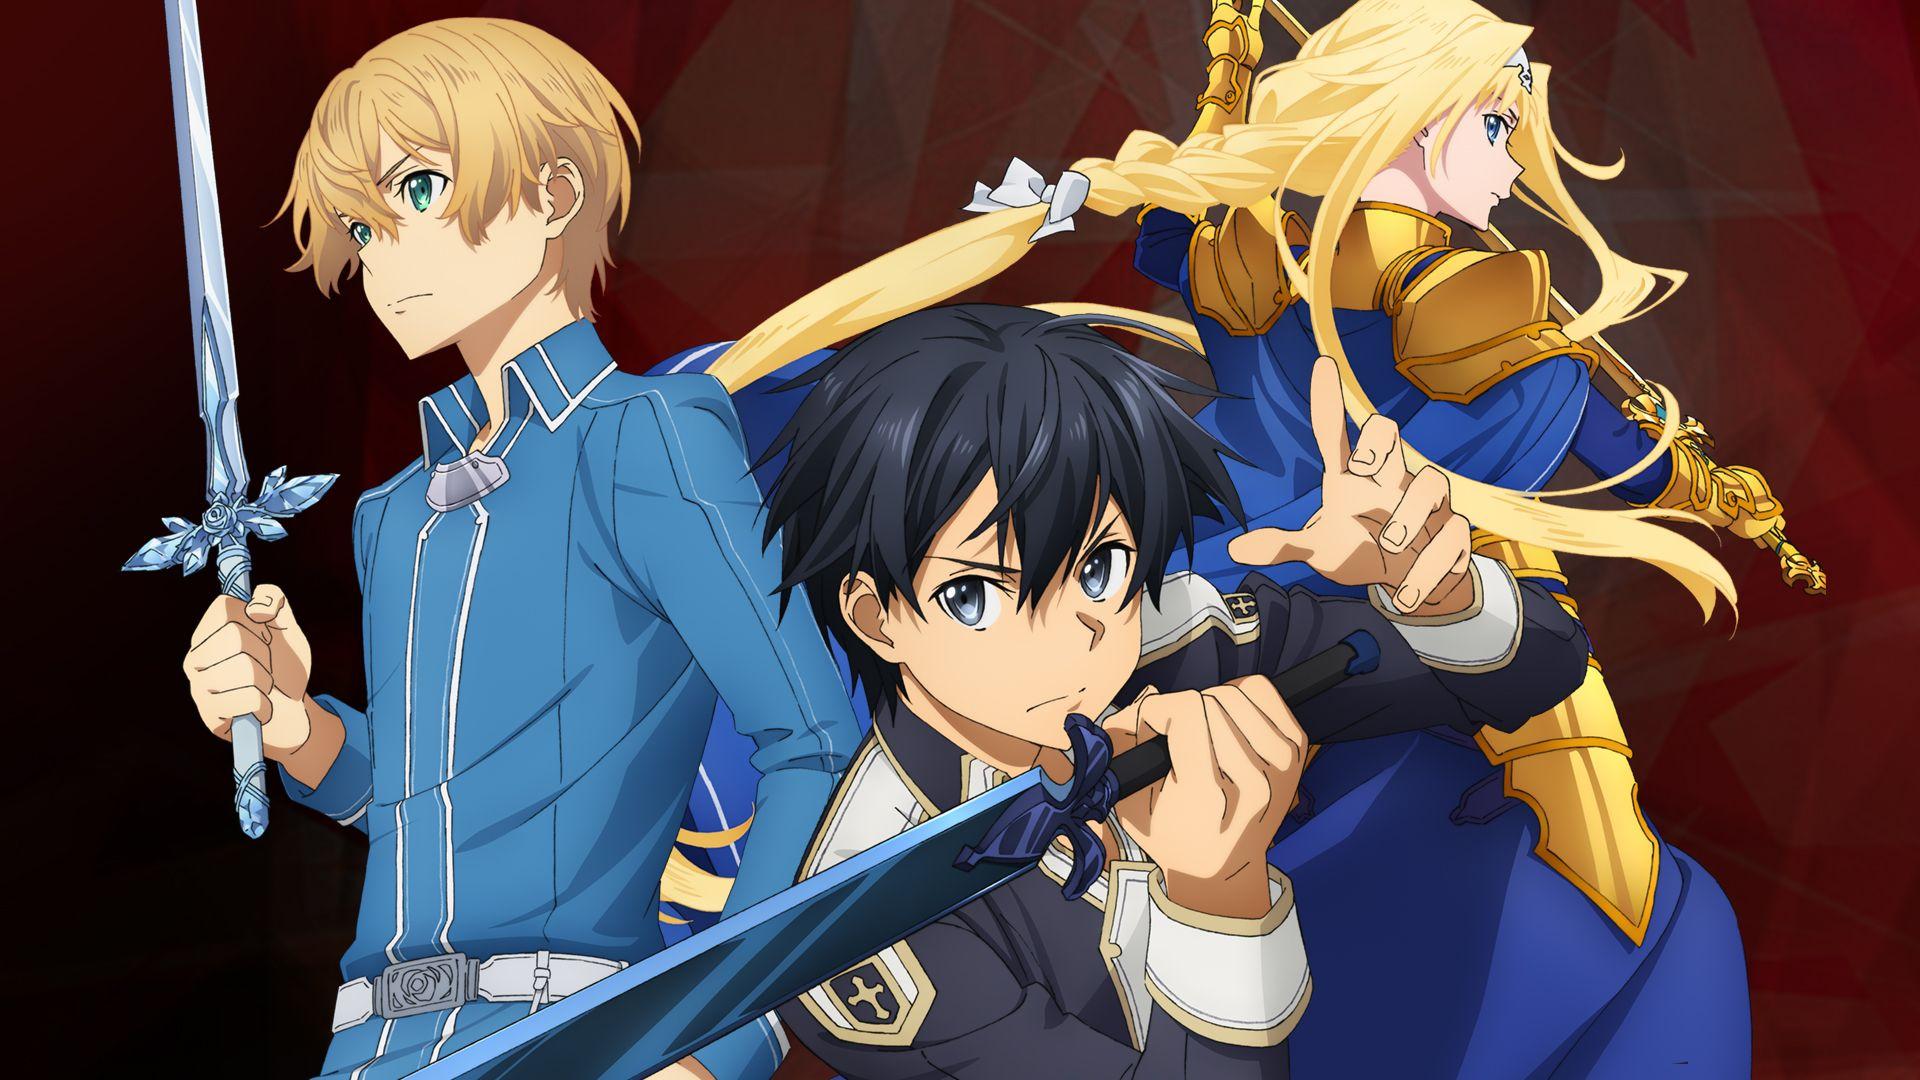 Sword Art Online Original Costume Design Contest Bandai Namco